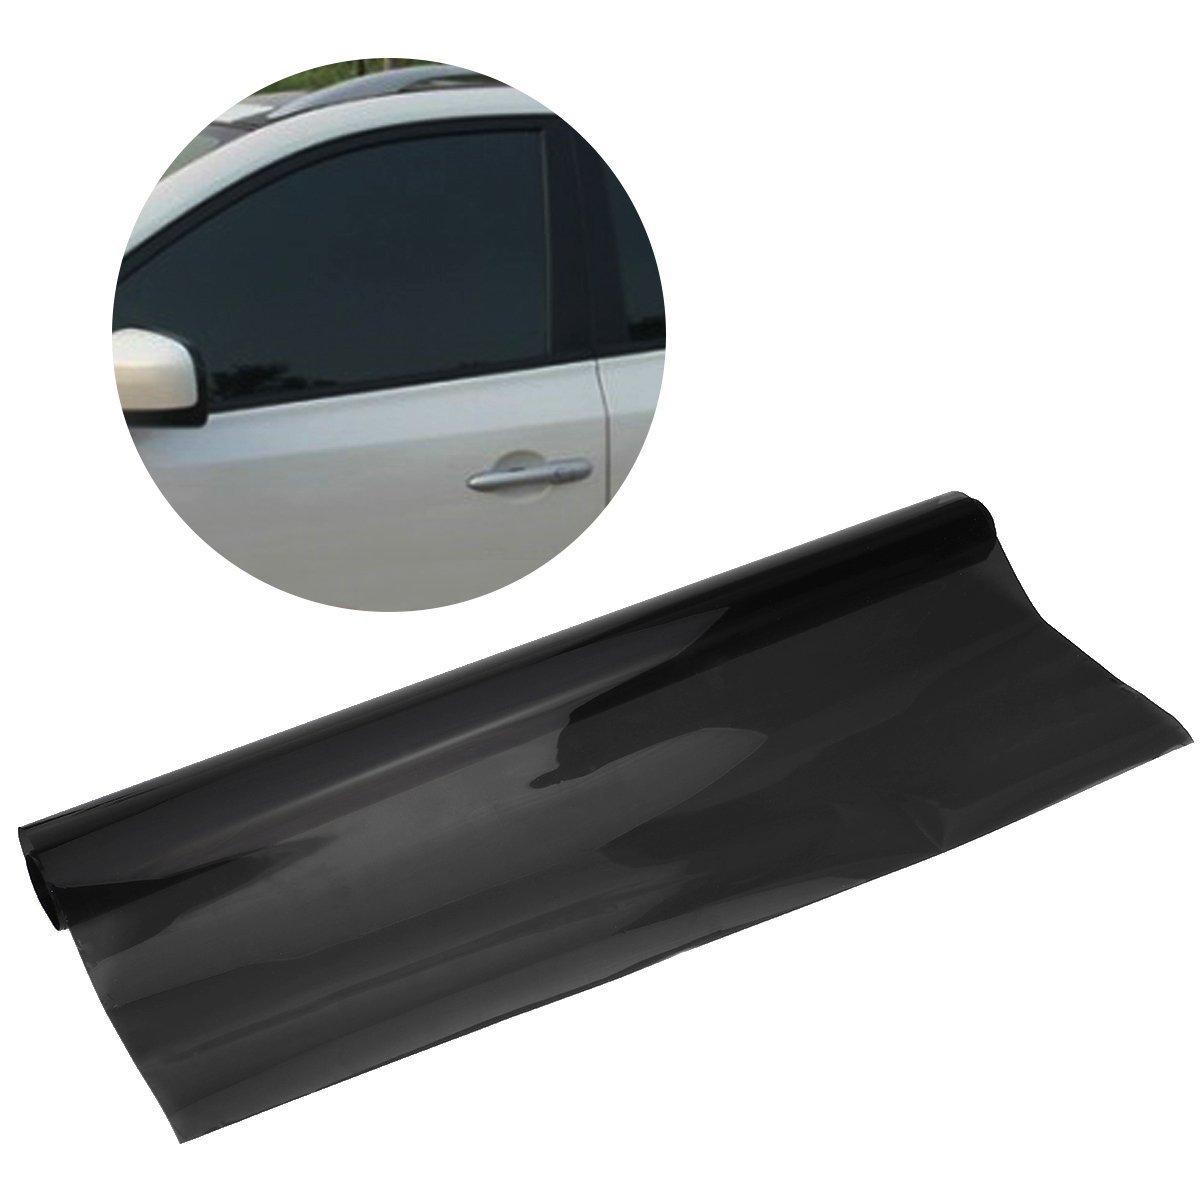 WINOMO Car Window Tint Film Reflective Window Tint Privacy Sticker for Car Home House Office (Dark Black)